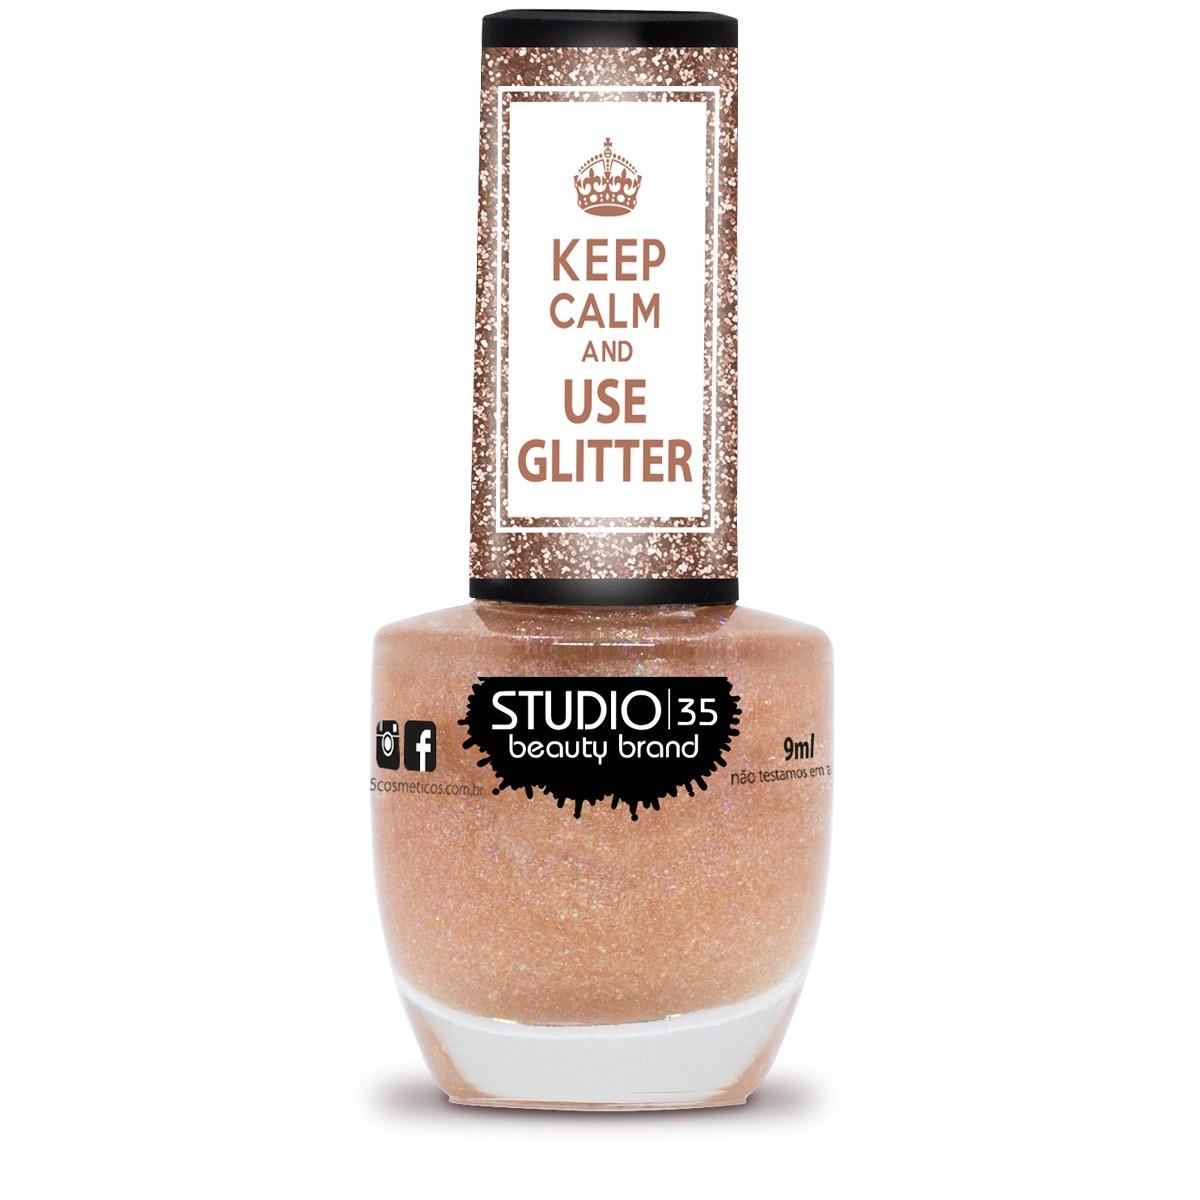 Esmalte Studio 35 #CoisaLinda Coleção Use Glitter